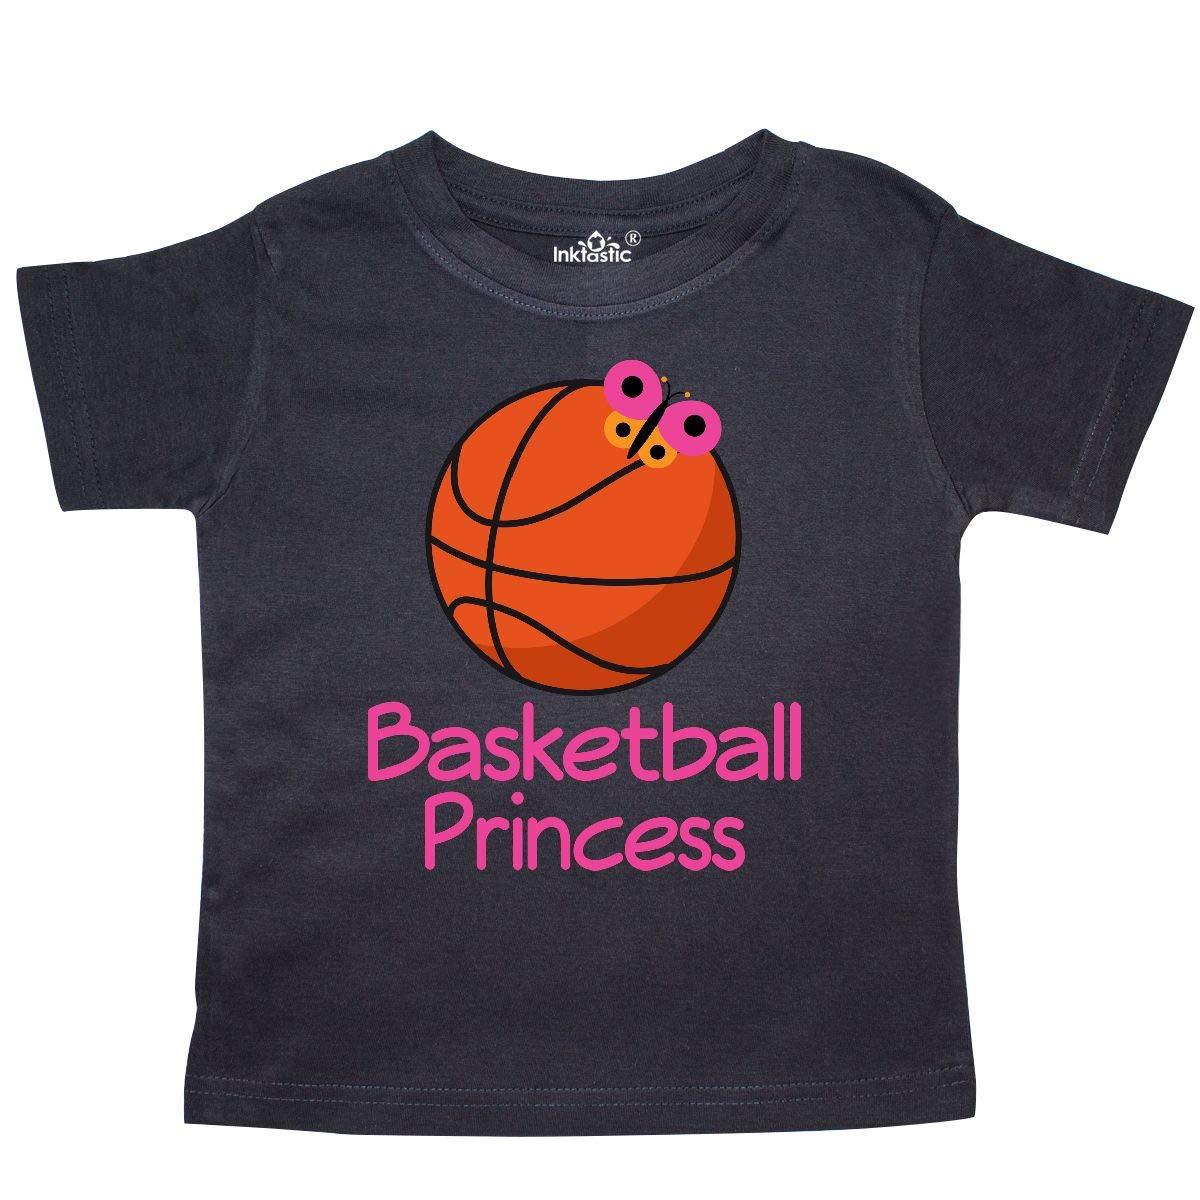 inktastic Basketball Princess Toddler T-Shirt